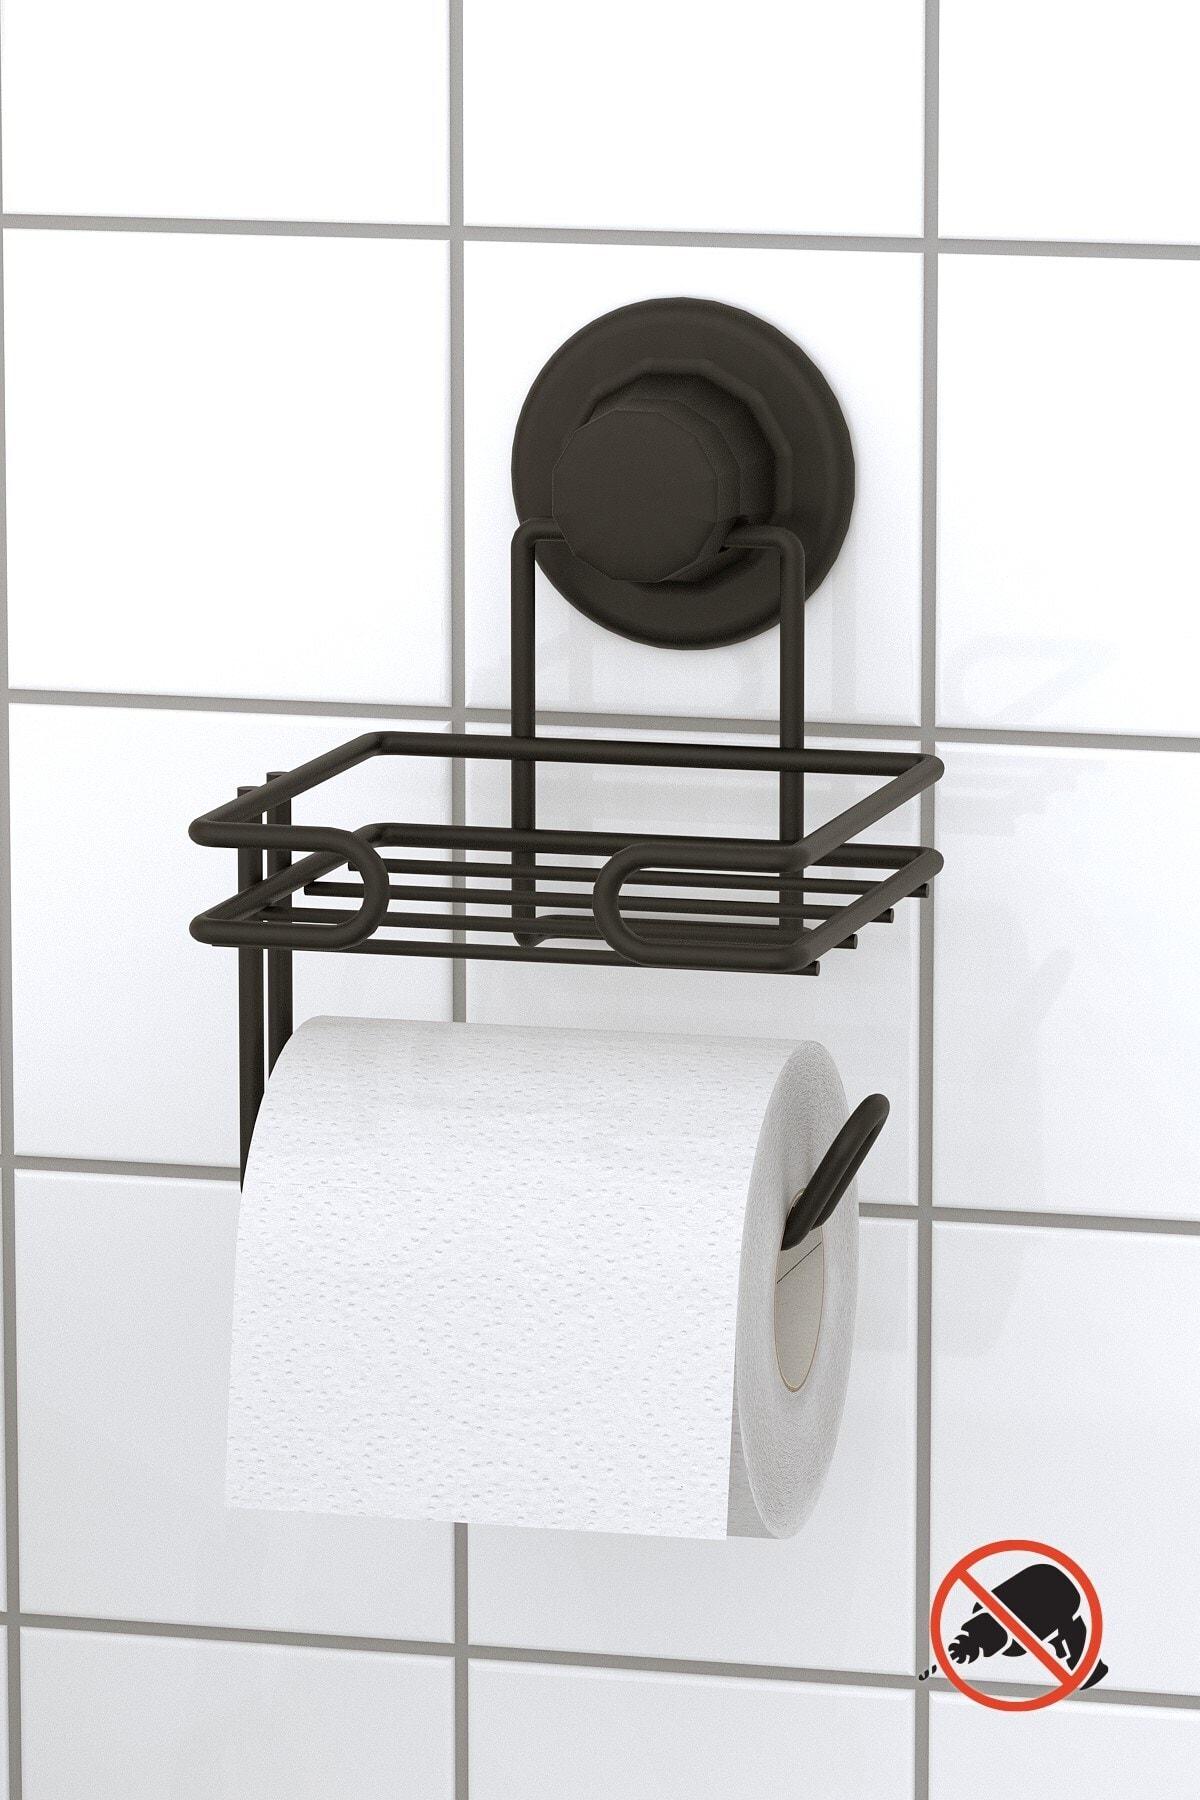 Teknotel Mat Siyah Vakumlu Yedekli Tuvalet Kağıtlık Dm275 1